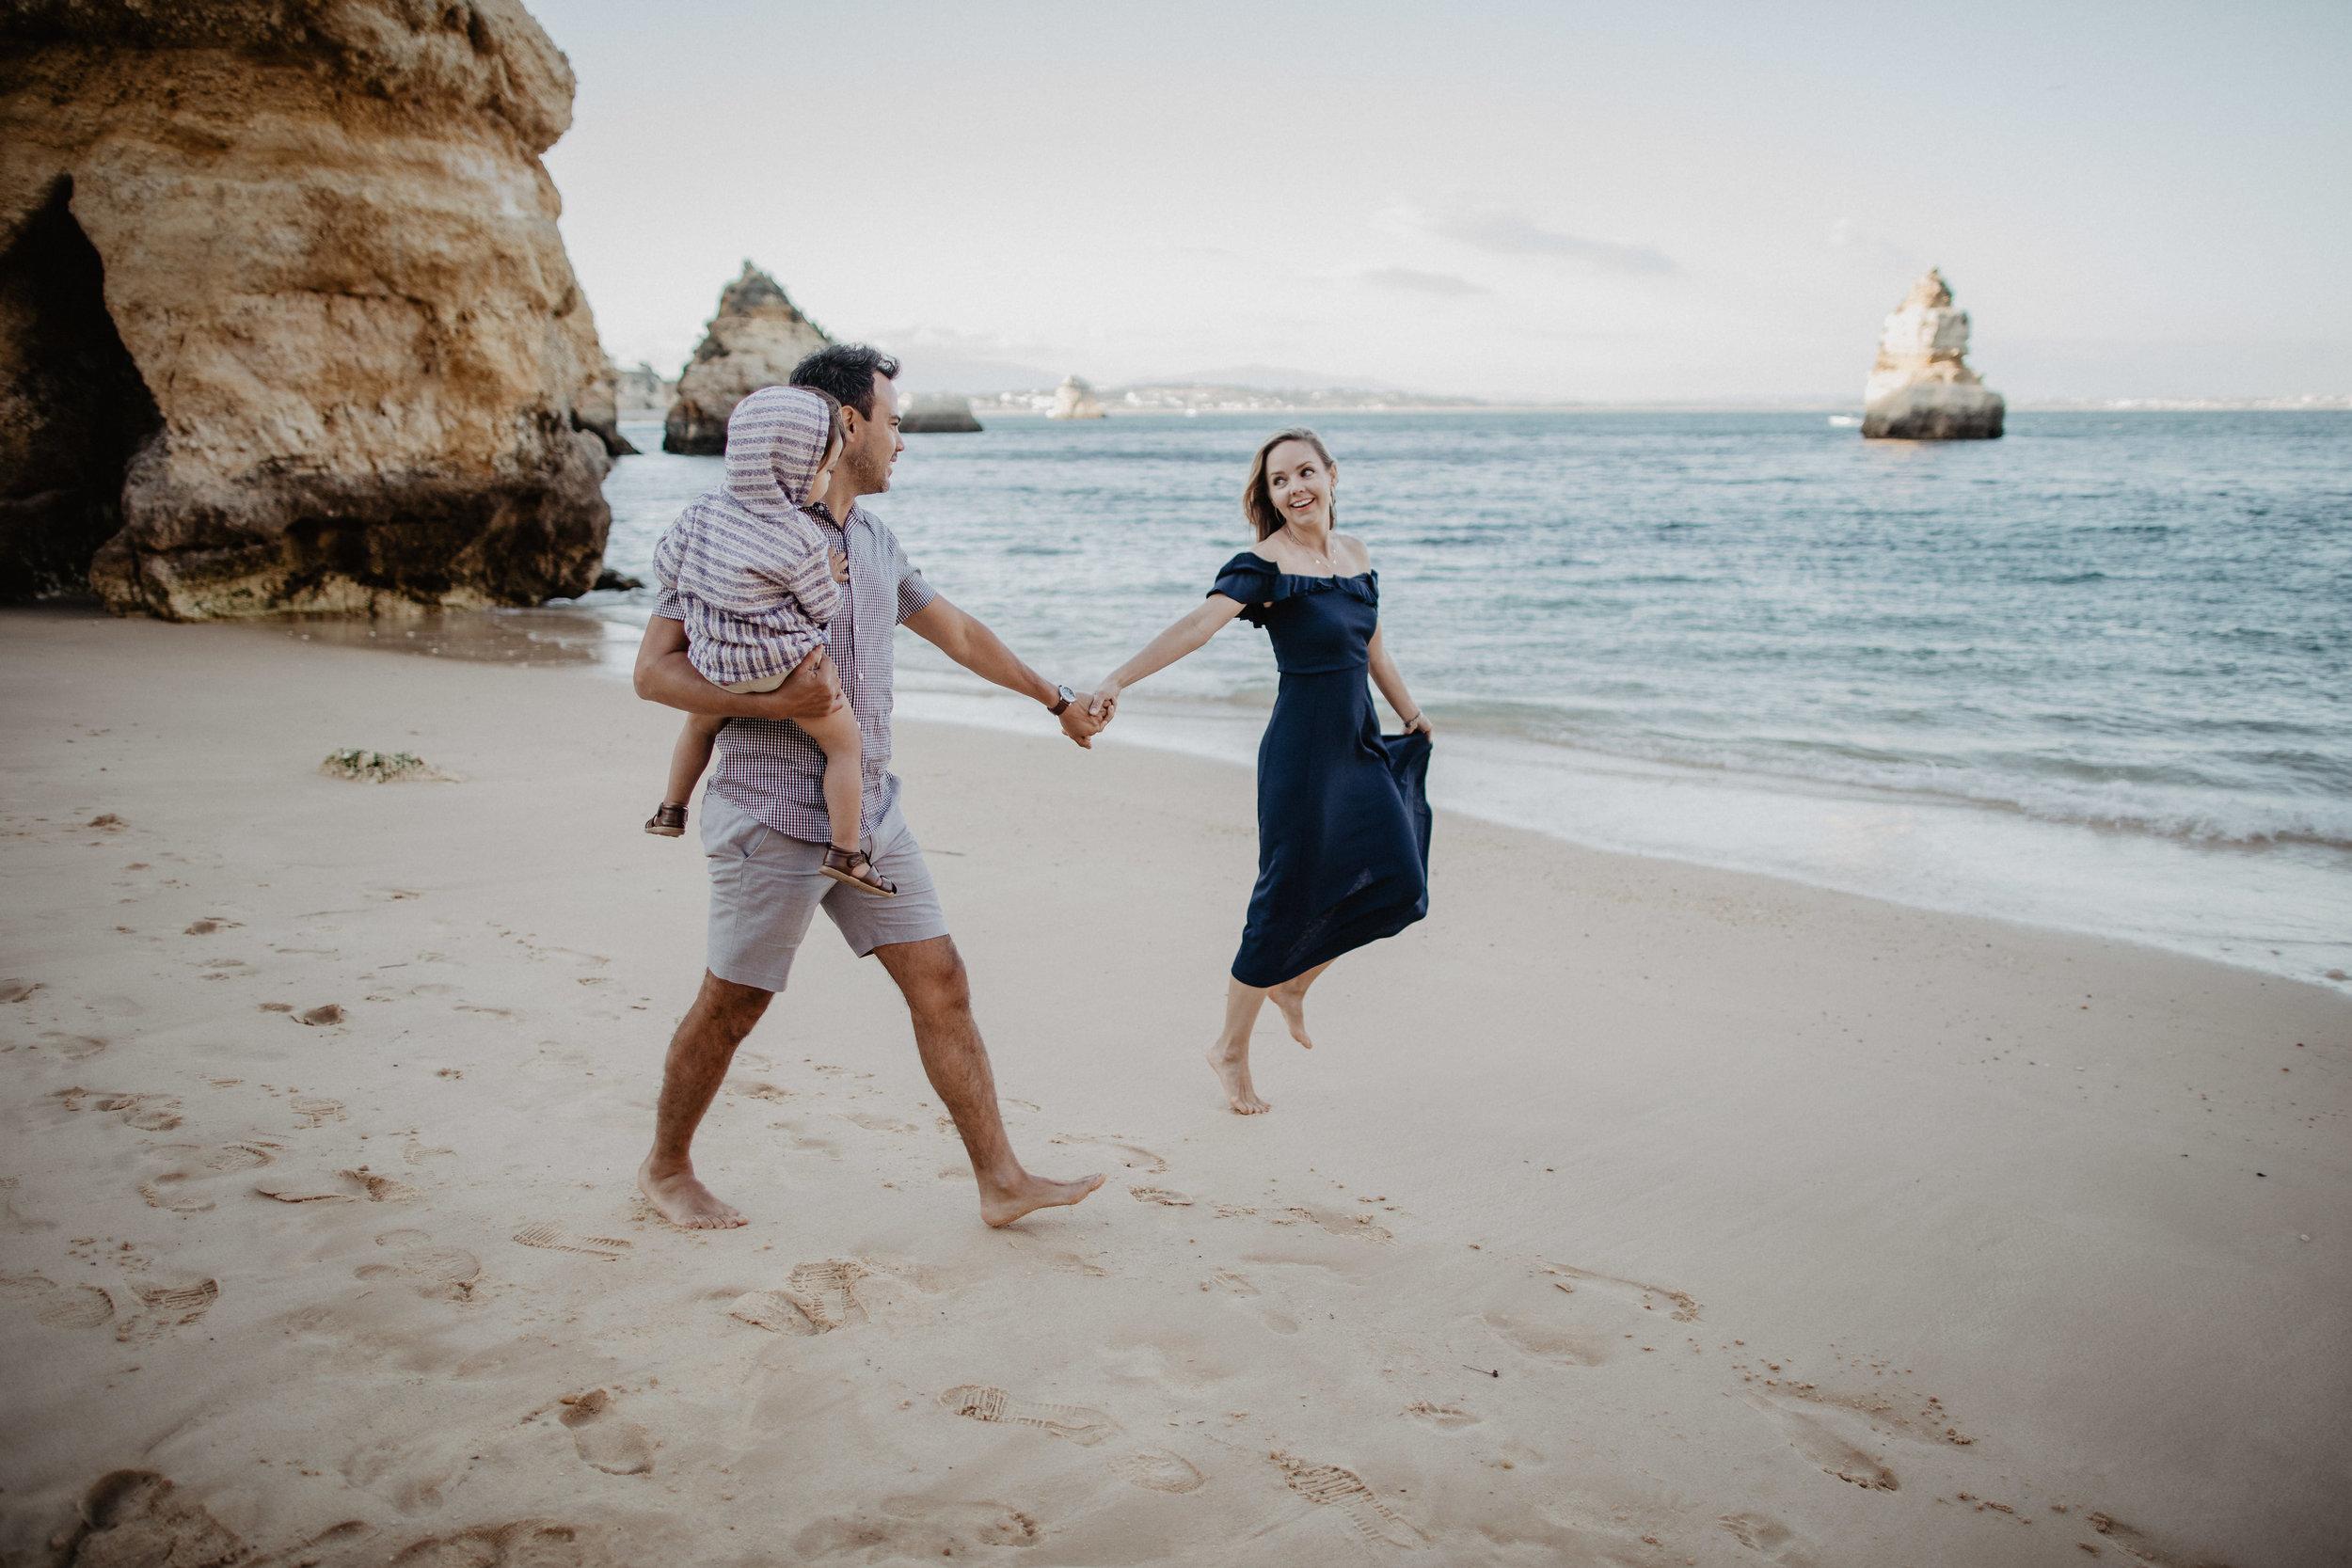 Lapela-Family-photography-Lagos-Algarve25.jpg